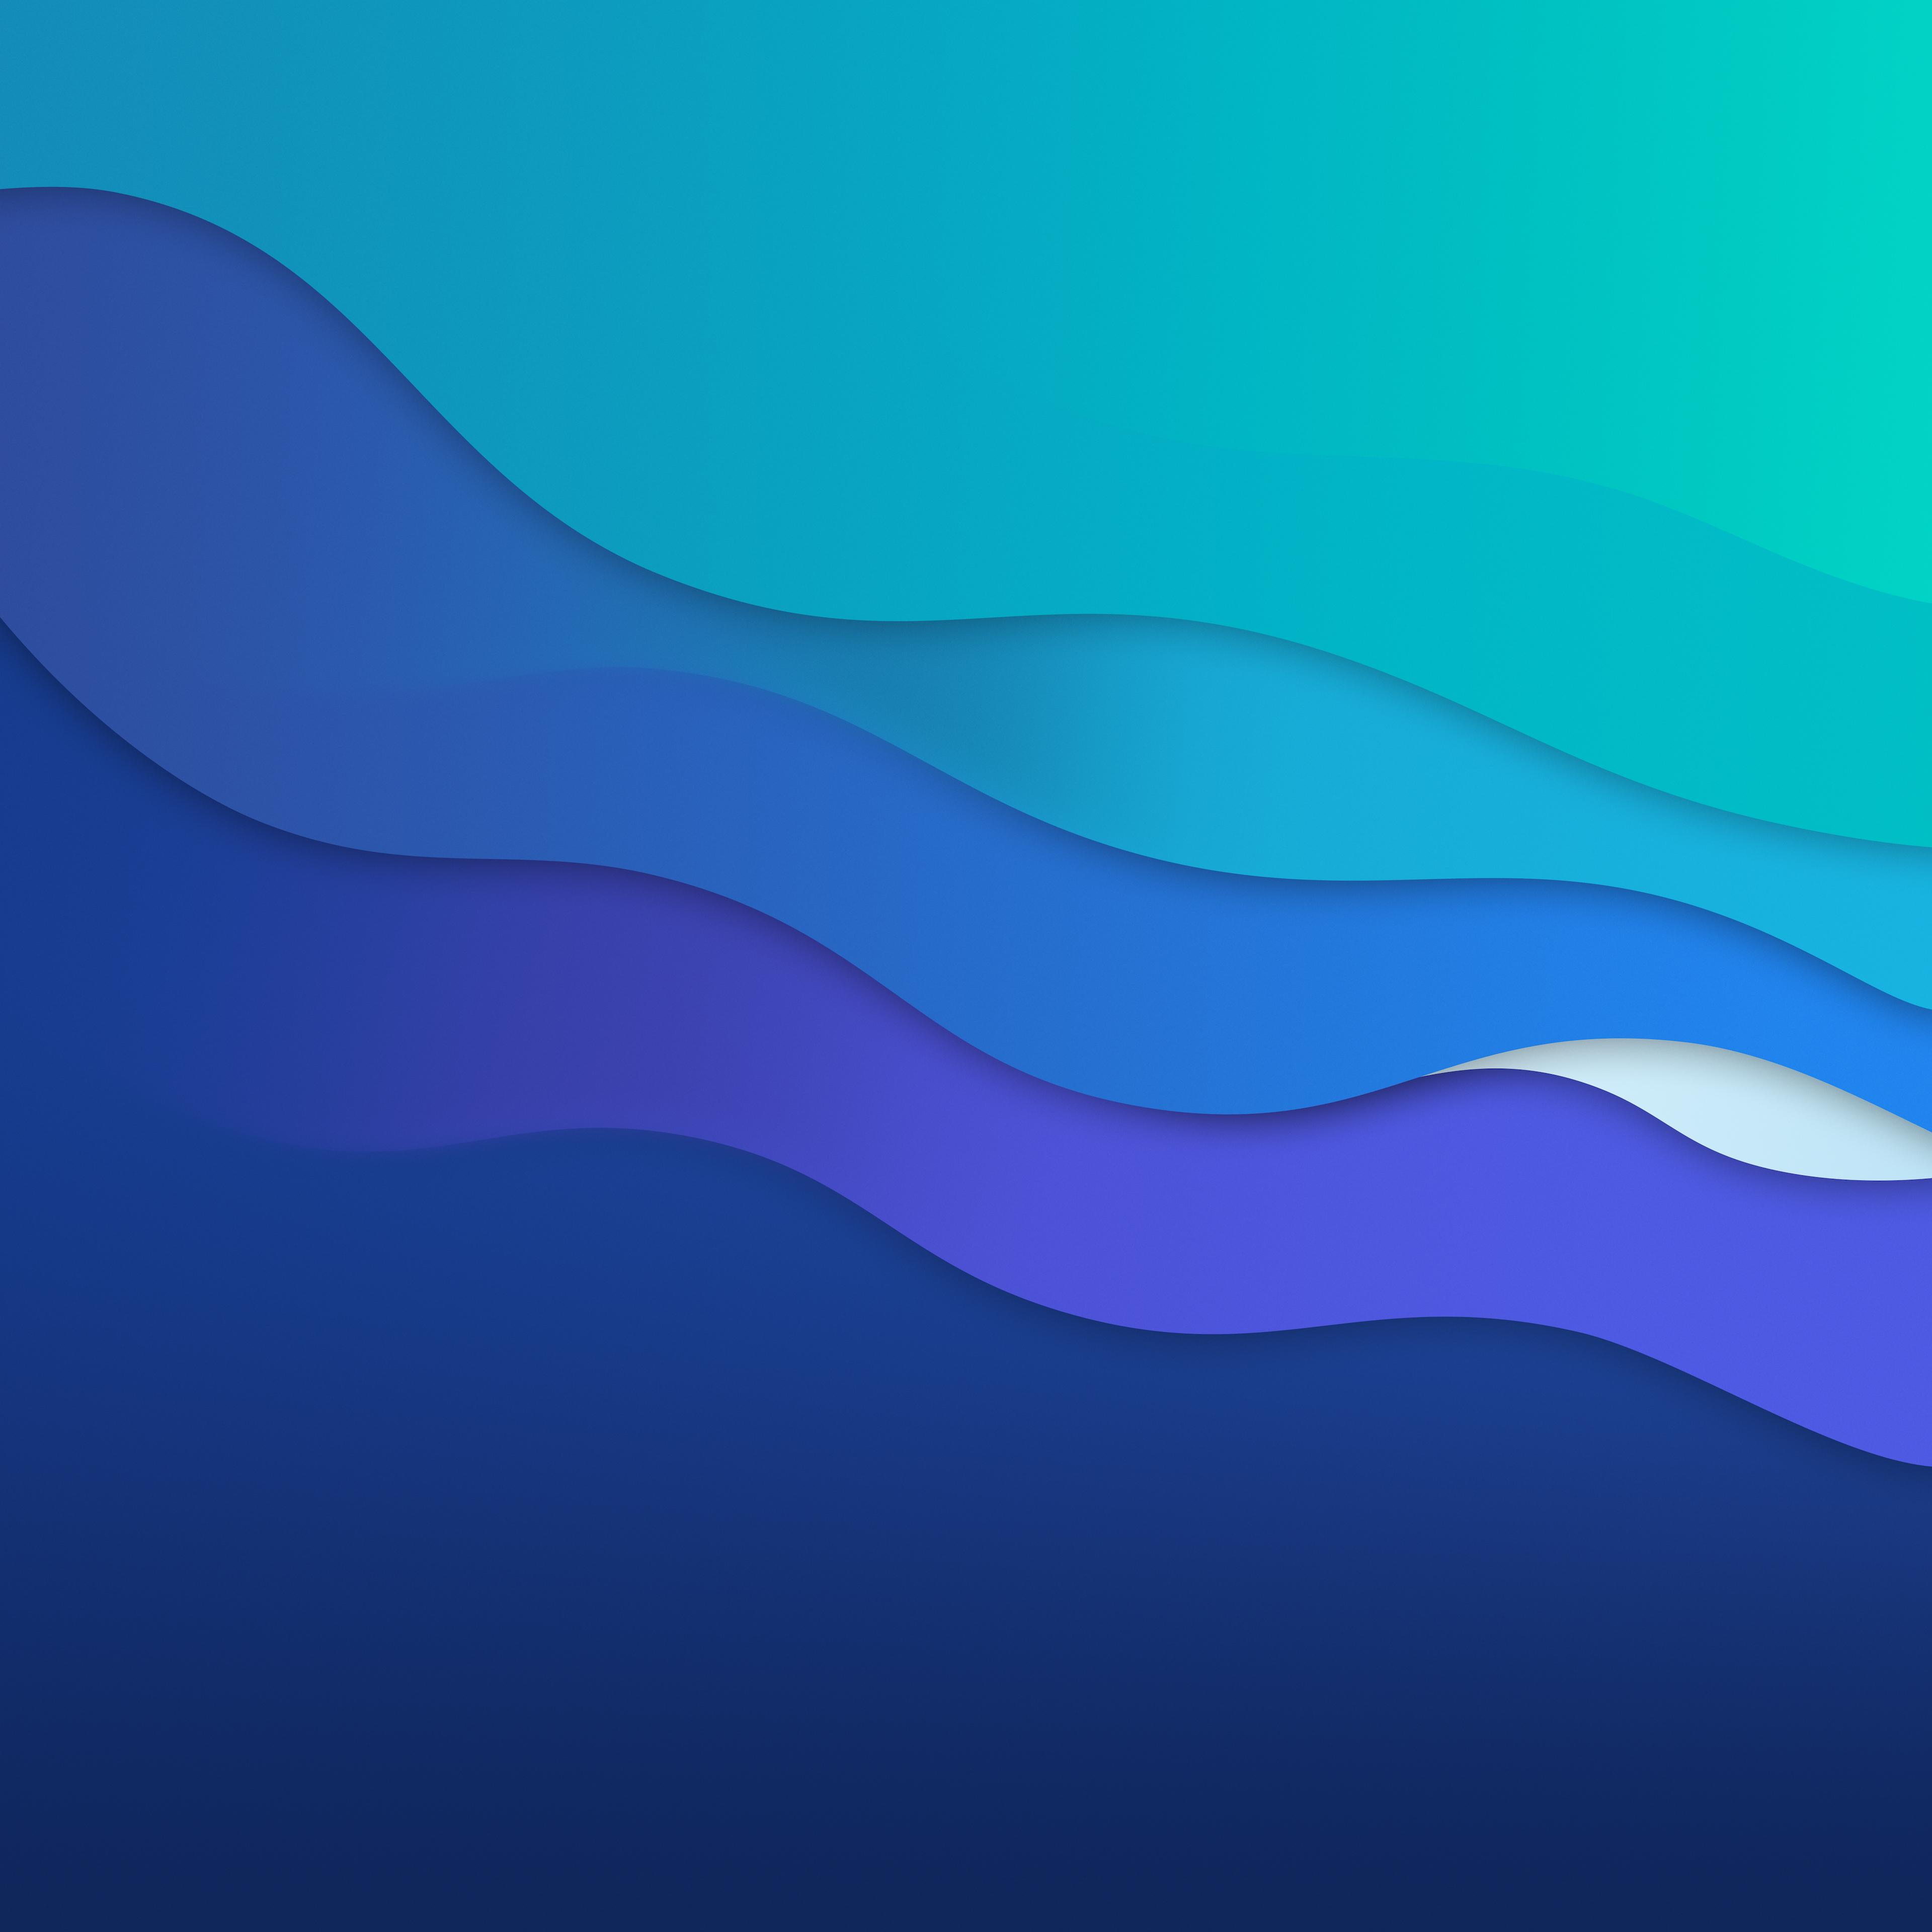 macOS Big Sur wallpaper inspiration javierocasio idownloadblog Waves Dark Alt 4K